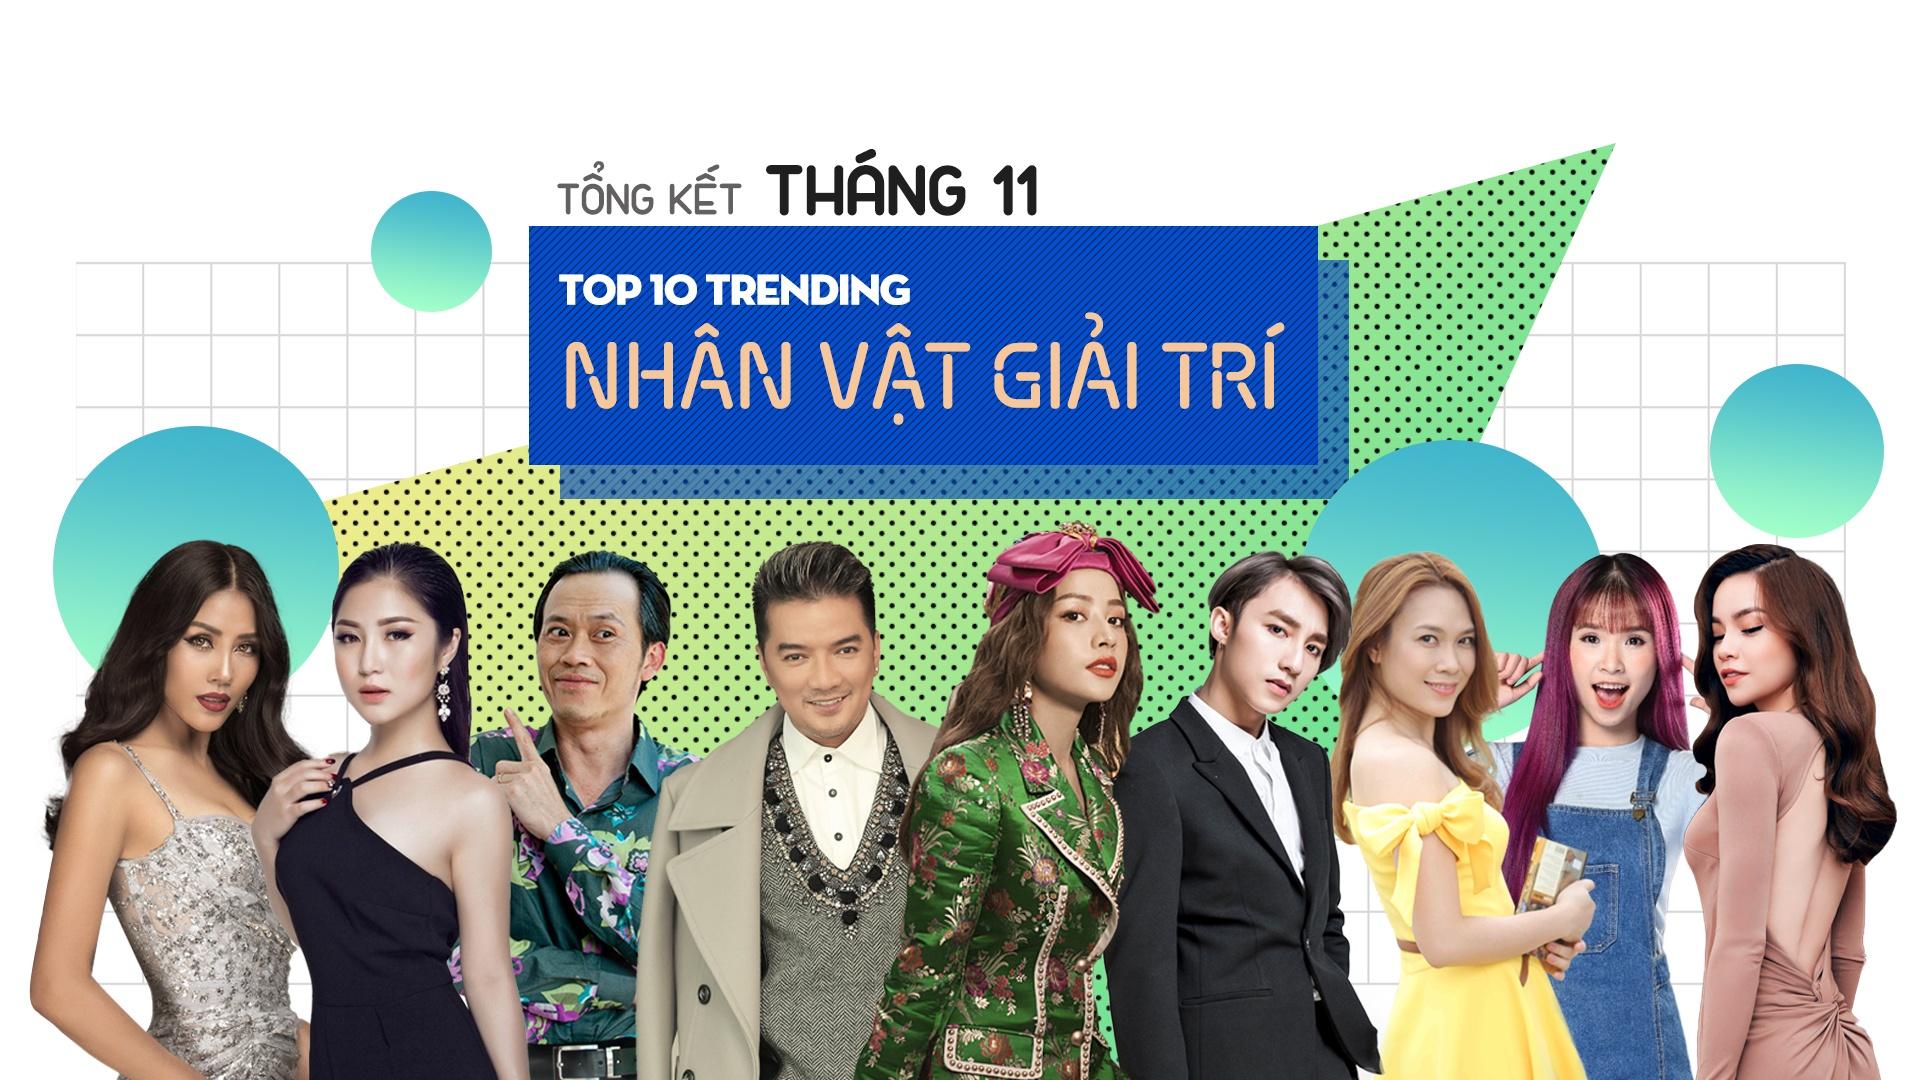 10 ngoi sao hot nhat Internet Viet Nam thang 11 hinh anh 1